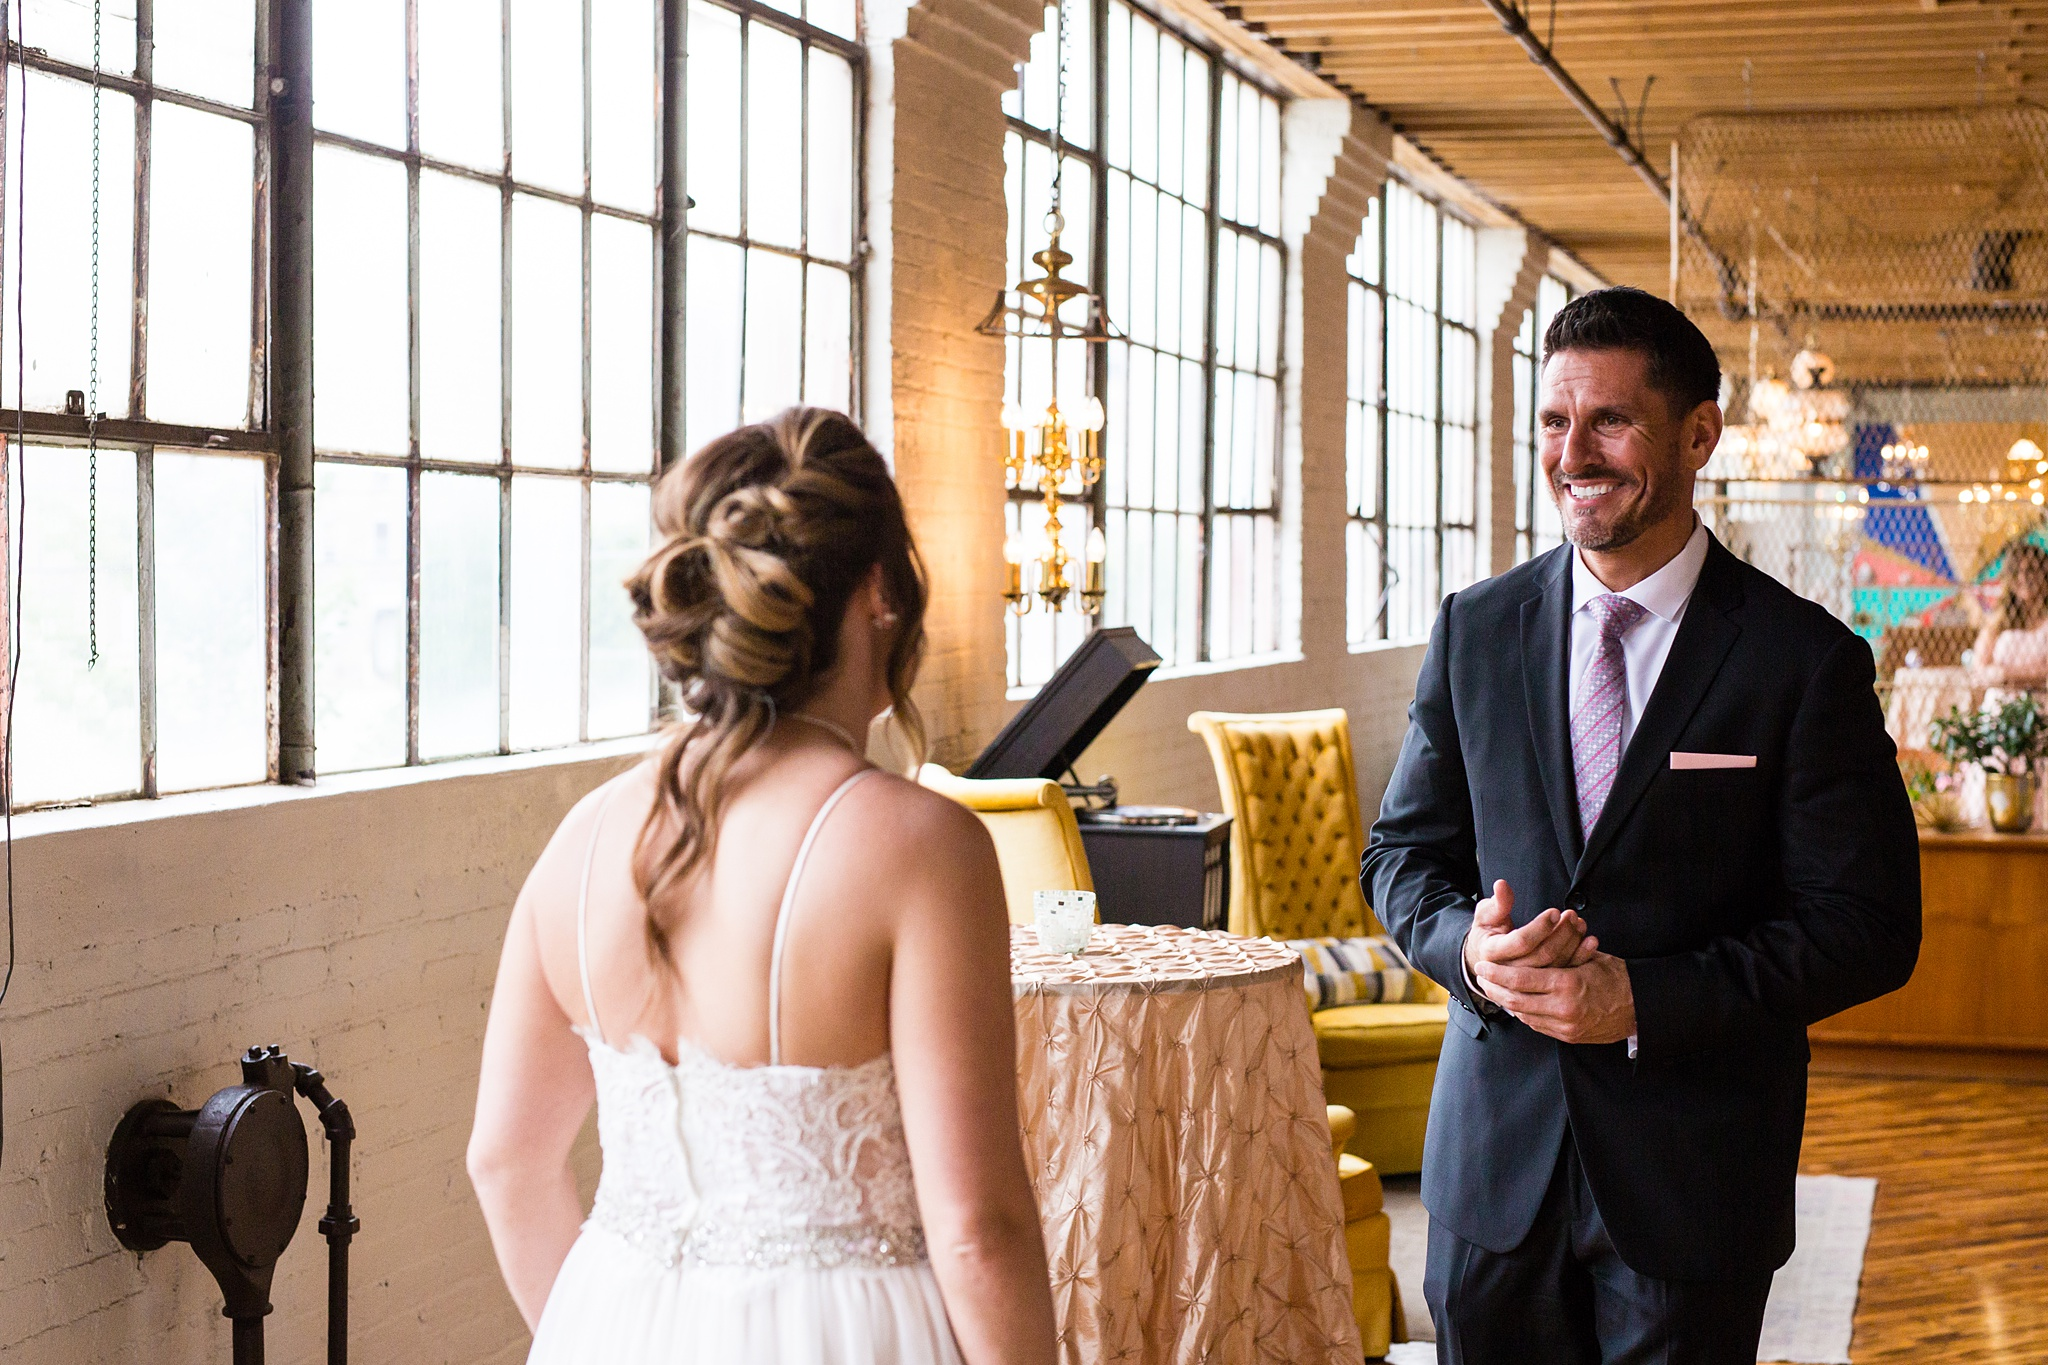 Meghan_Drew_Grand_Rapids_Cheney_place_Wedding019.JPG